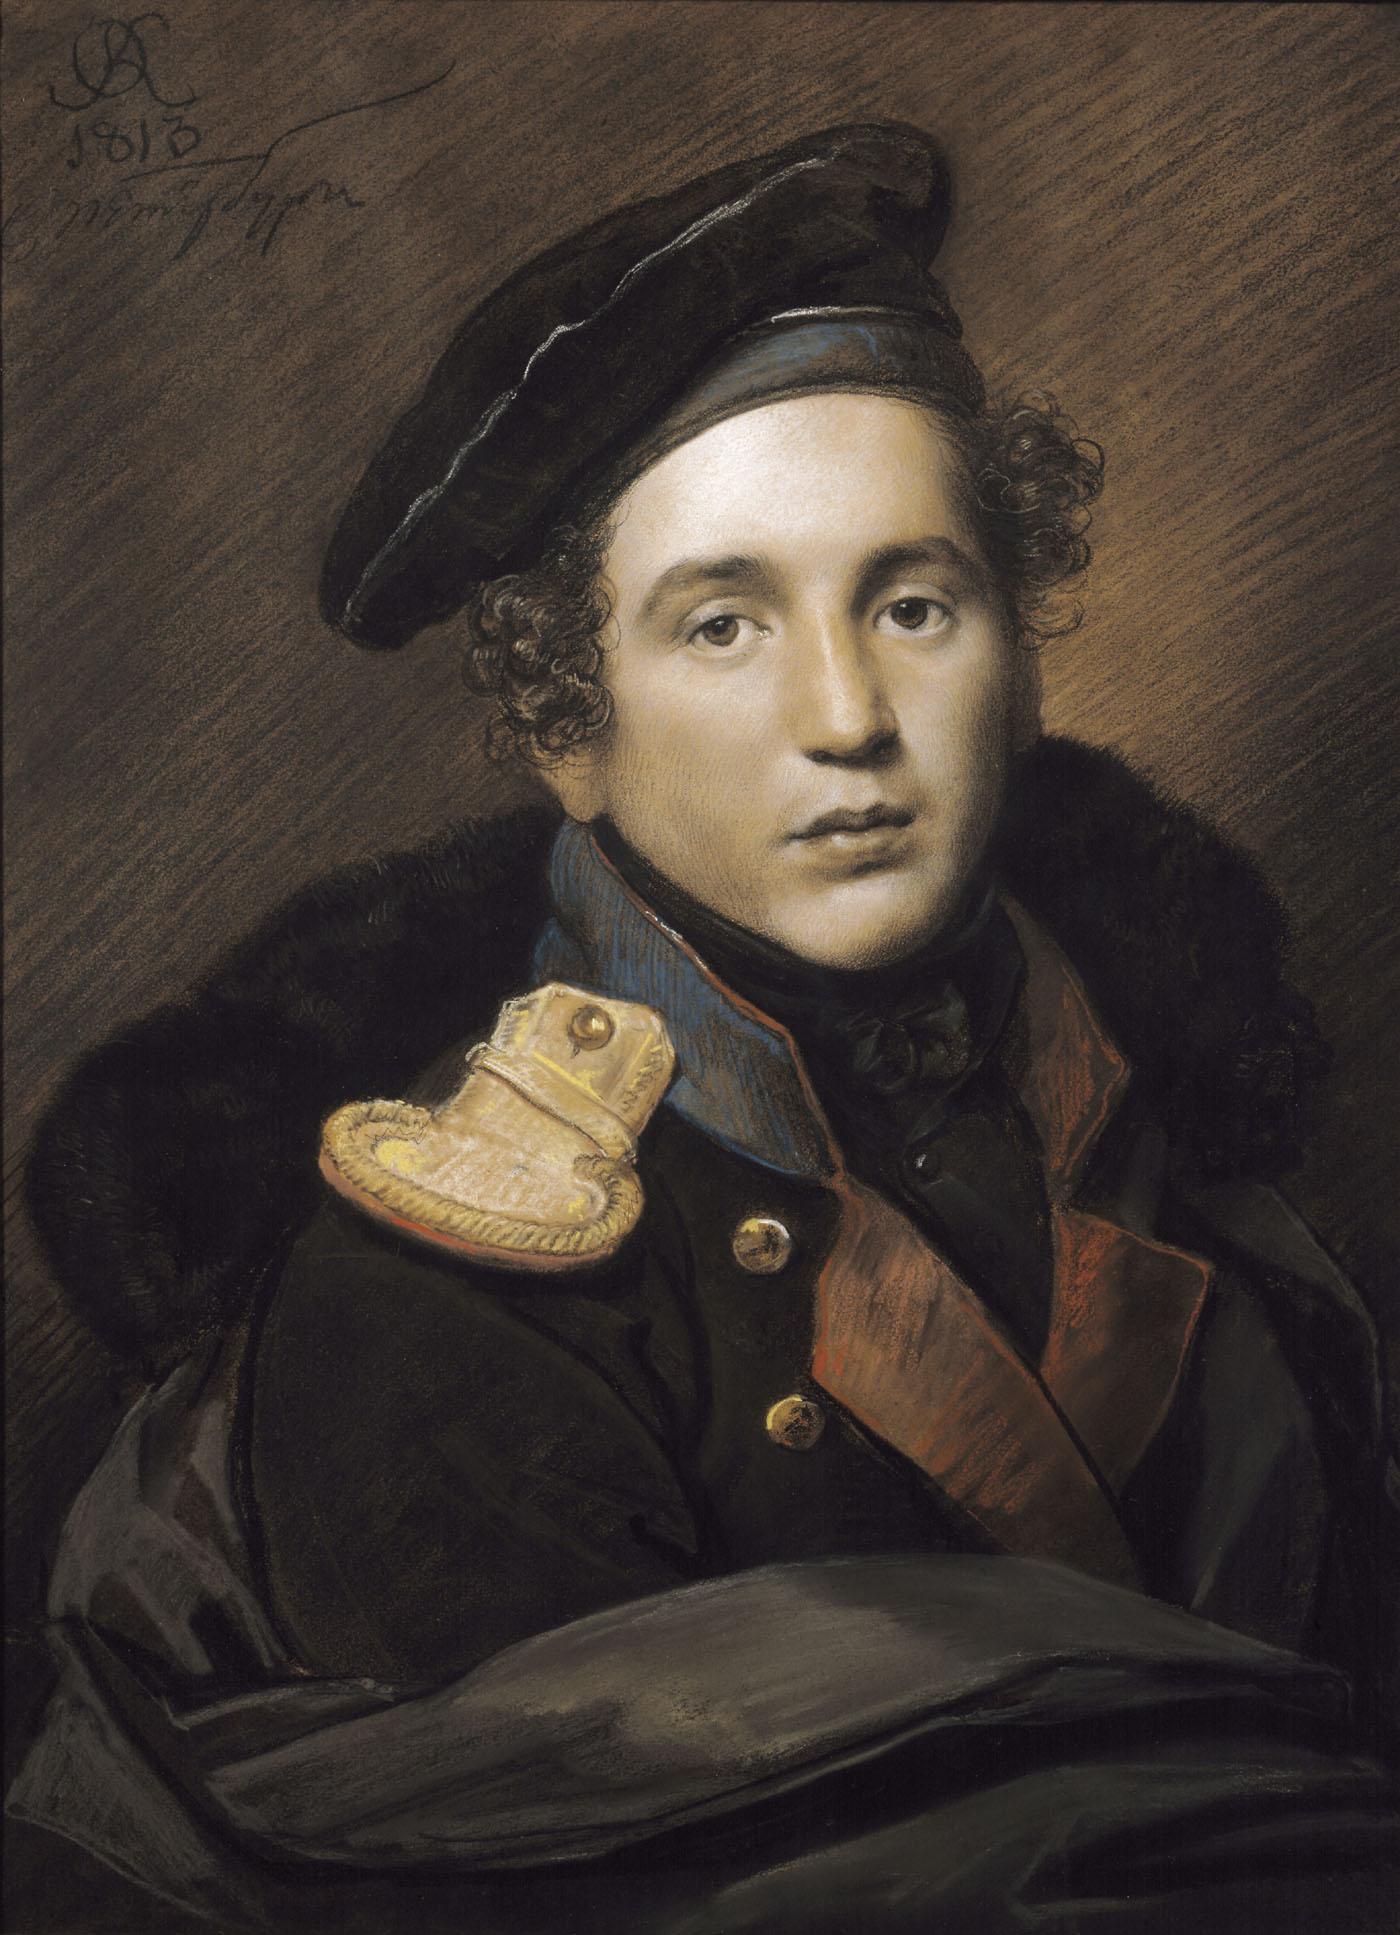 ... Оленина - Орест Кипренский - WikiArt.org: www.wikiart.org/ru/orest-kiprensky/portrait-of-pyotr-olenin-1813